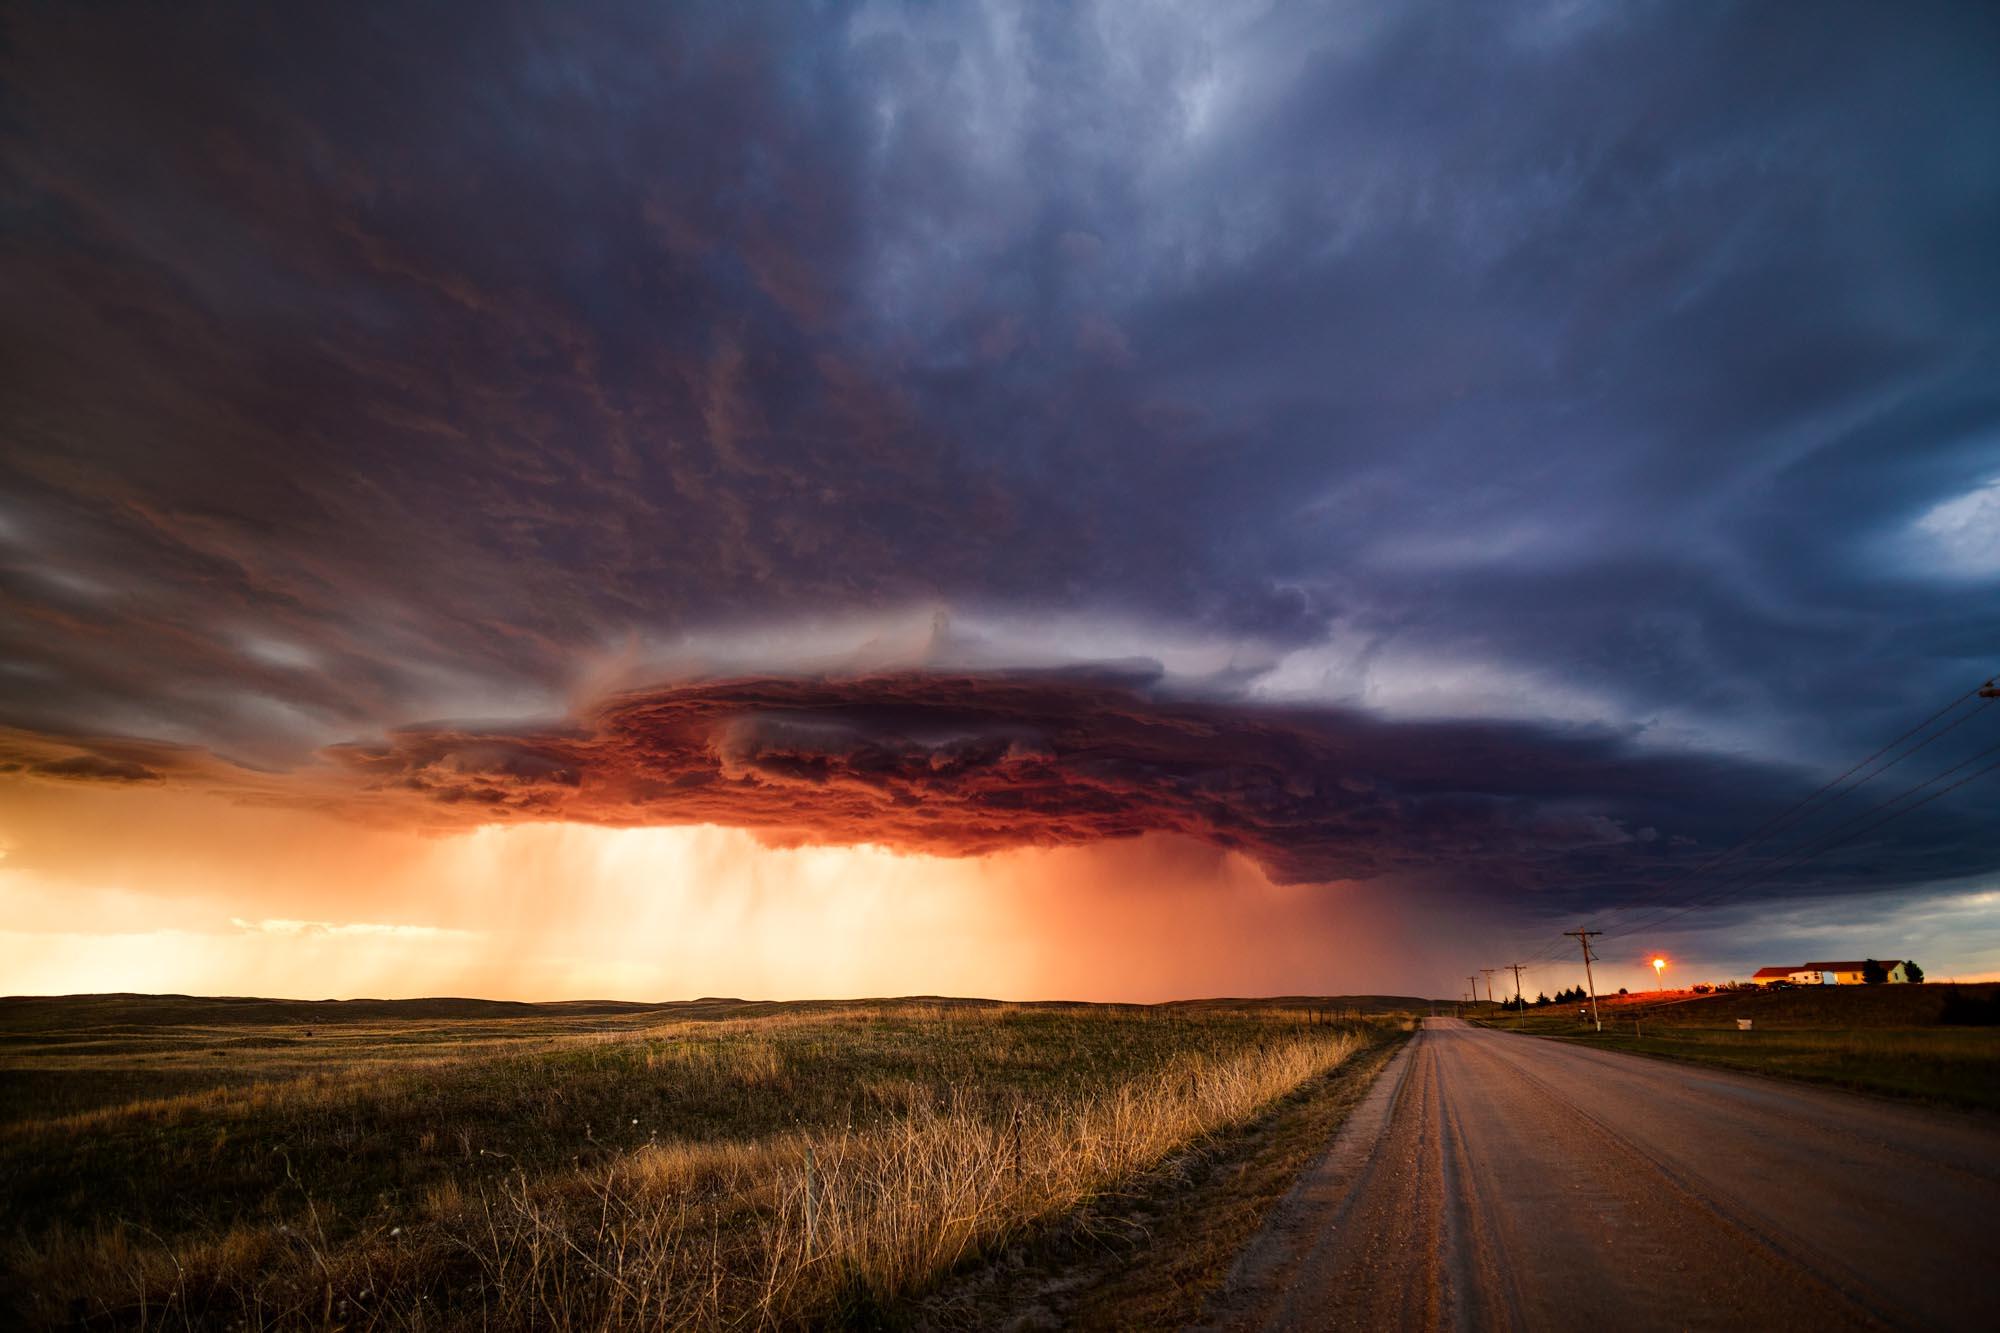 A powerful supercell thunderstorm at sunset spins across the sand hills near North Platte, Nebraska